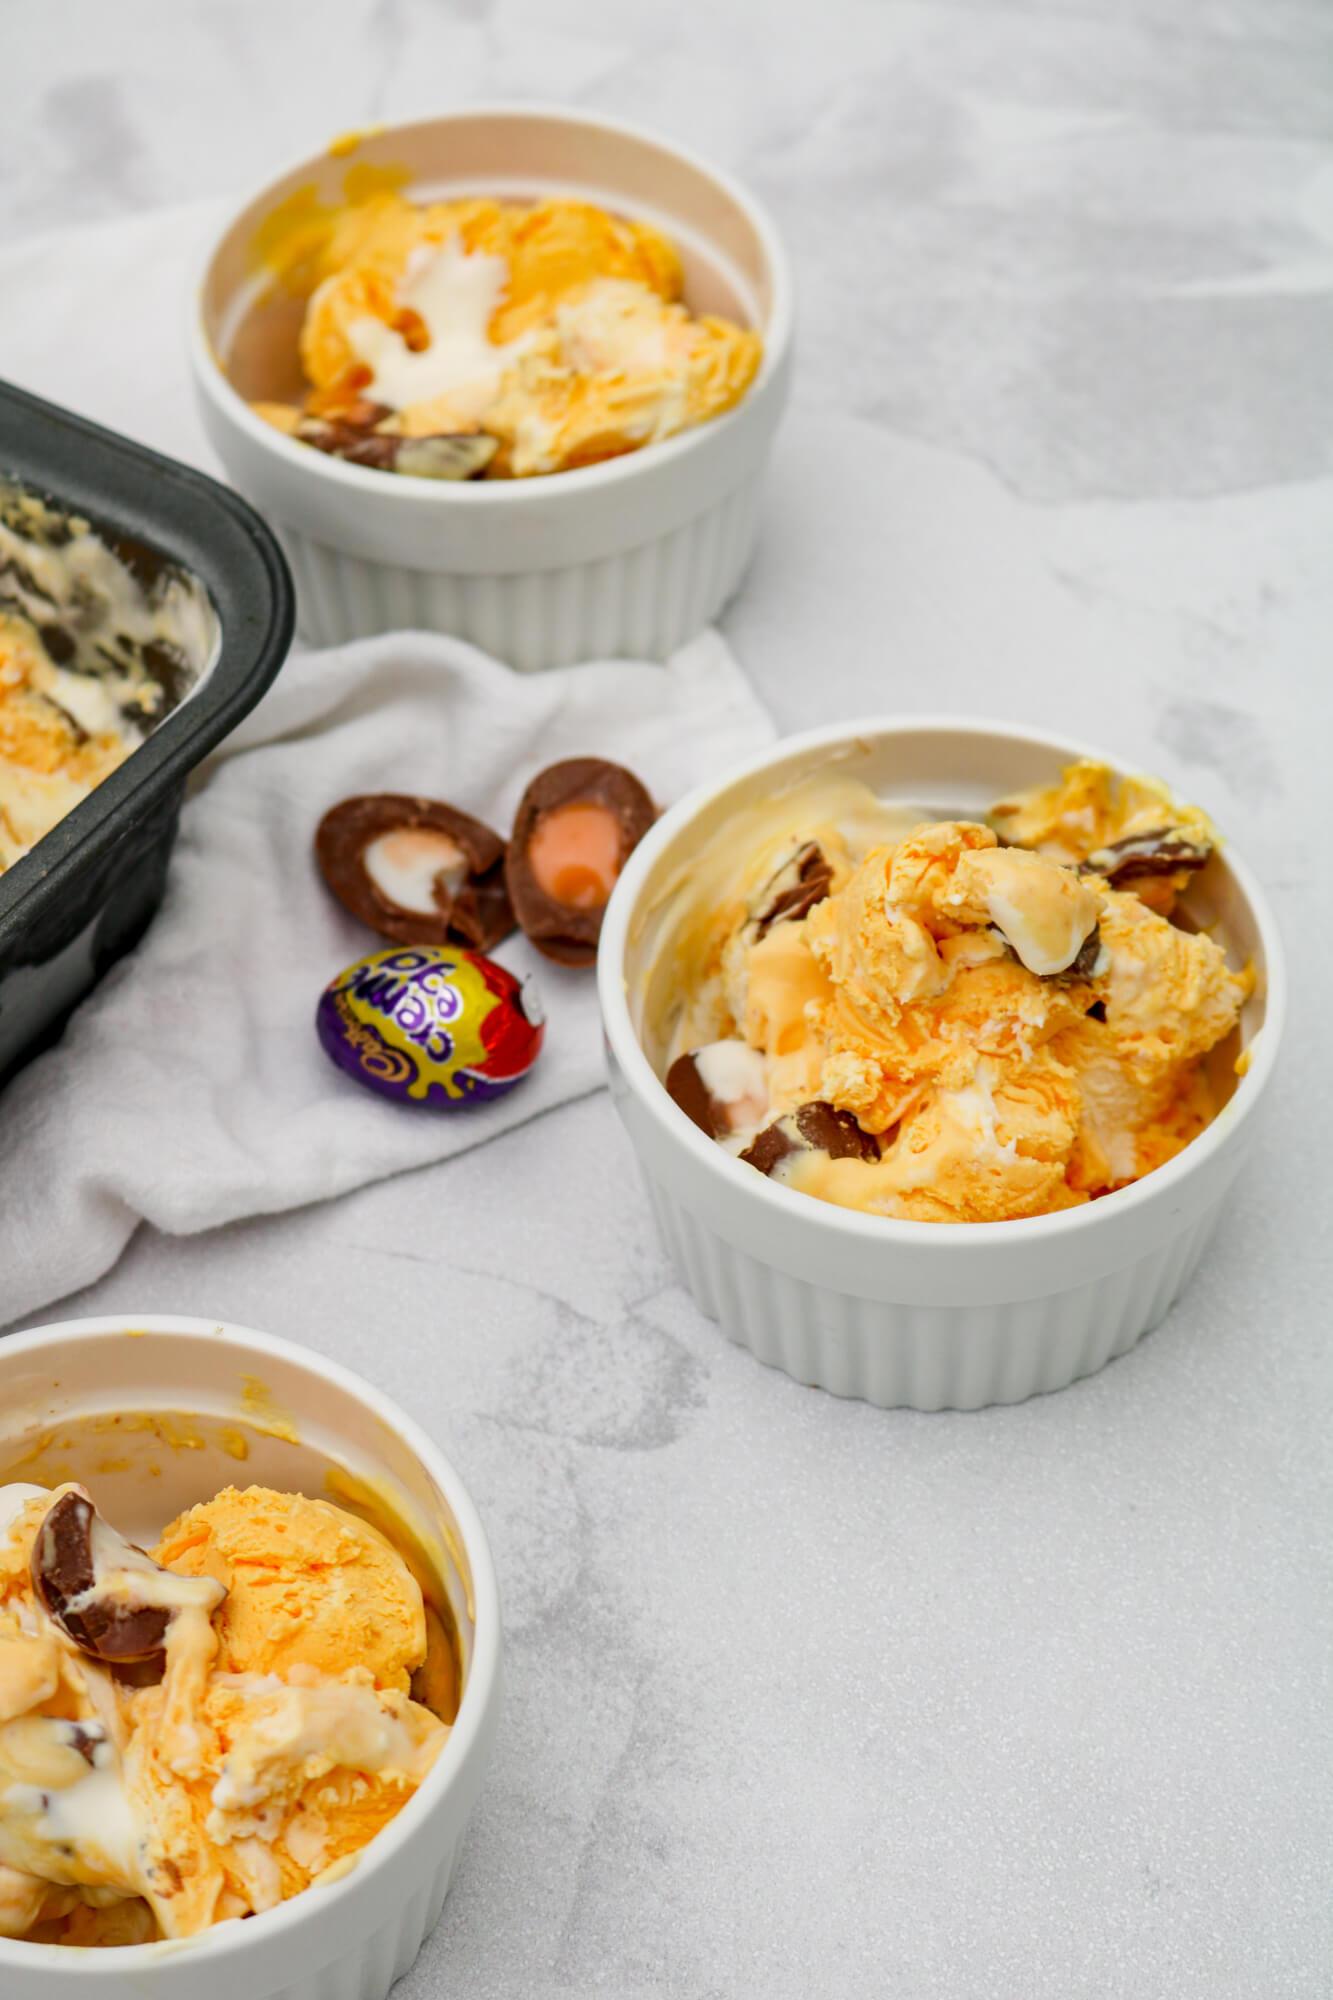 No Churn Creme Egg Ice Cream | Take Some Whisks